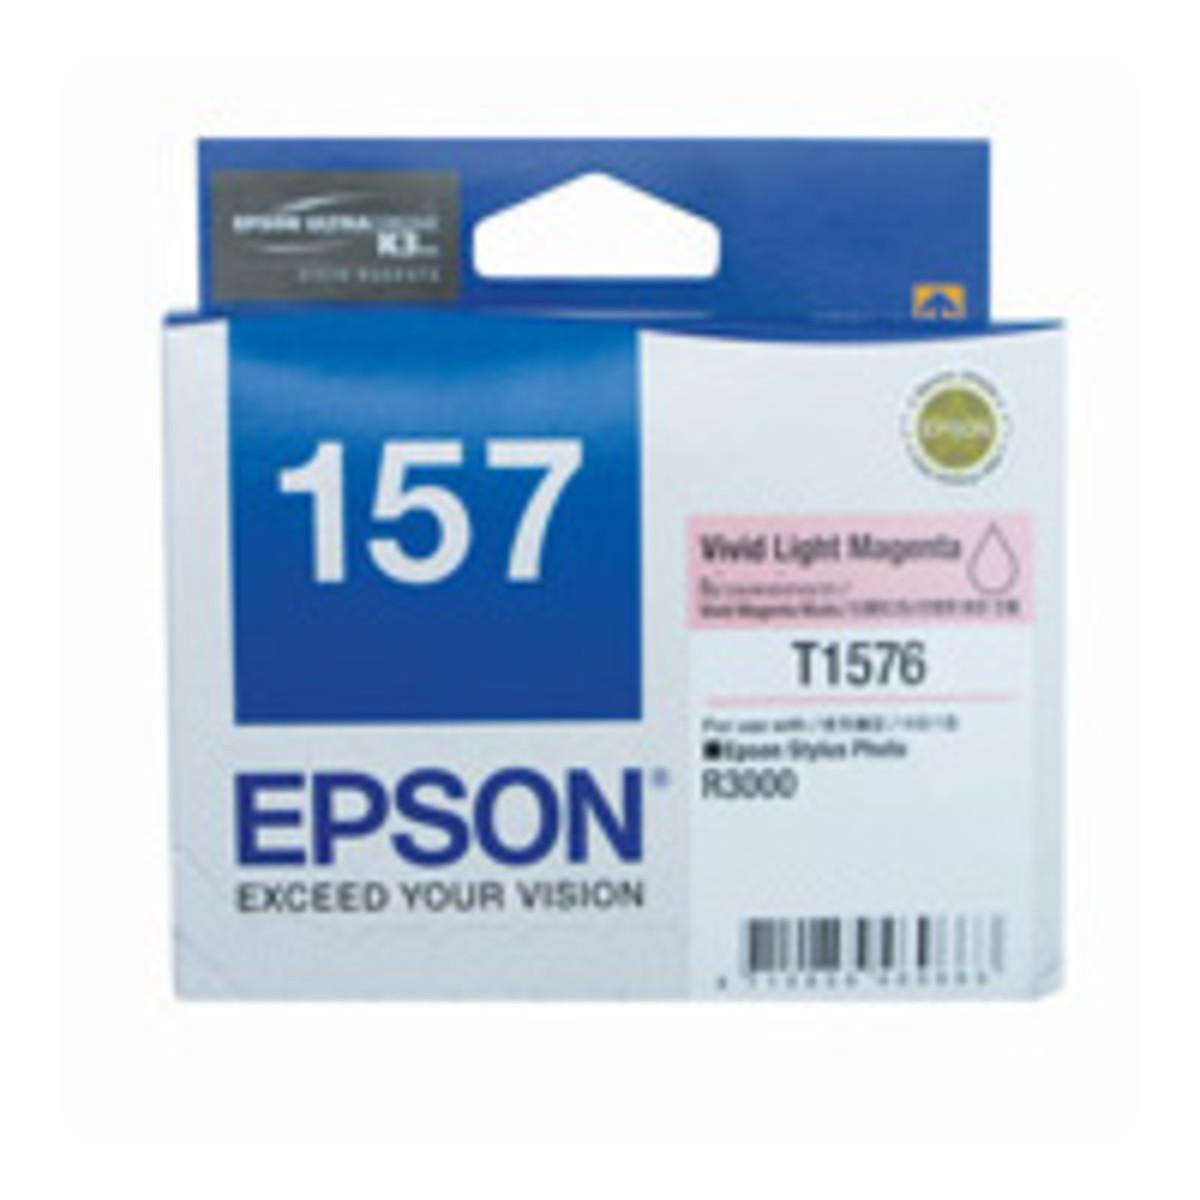 Epson 157 Vivid Light Magenta Ink Cartridge